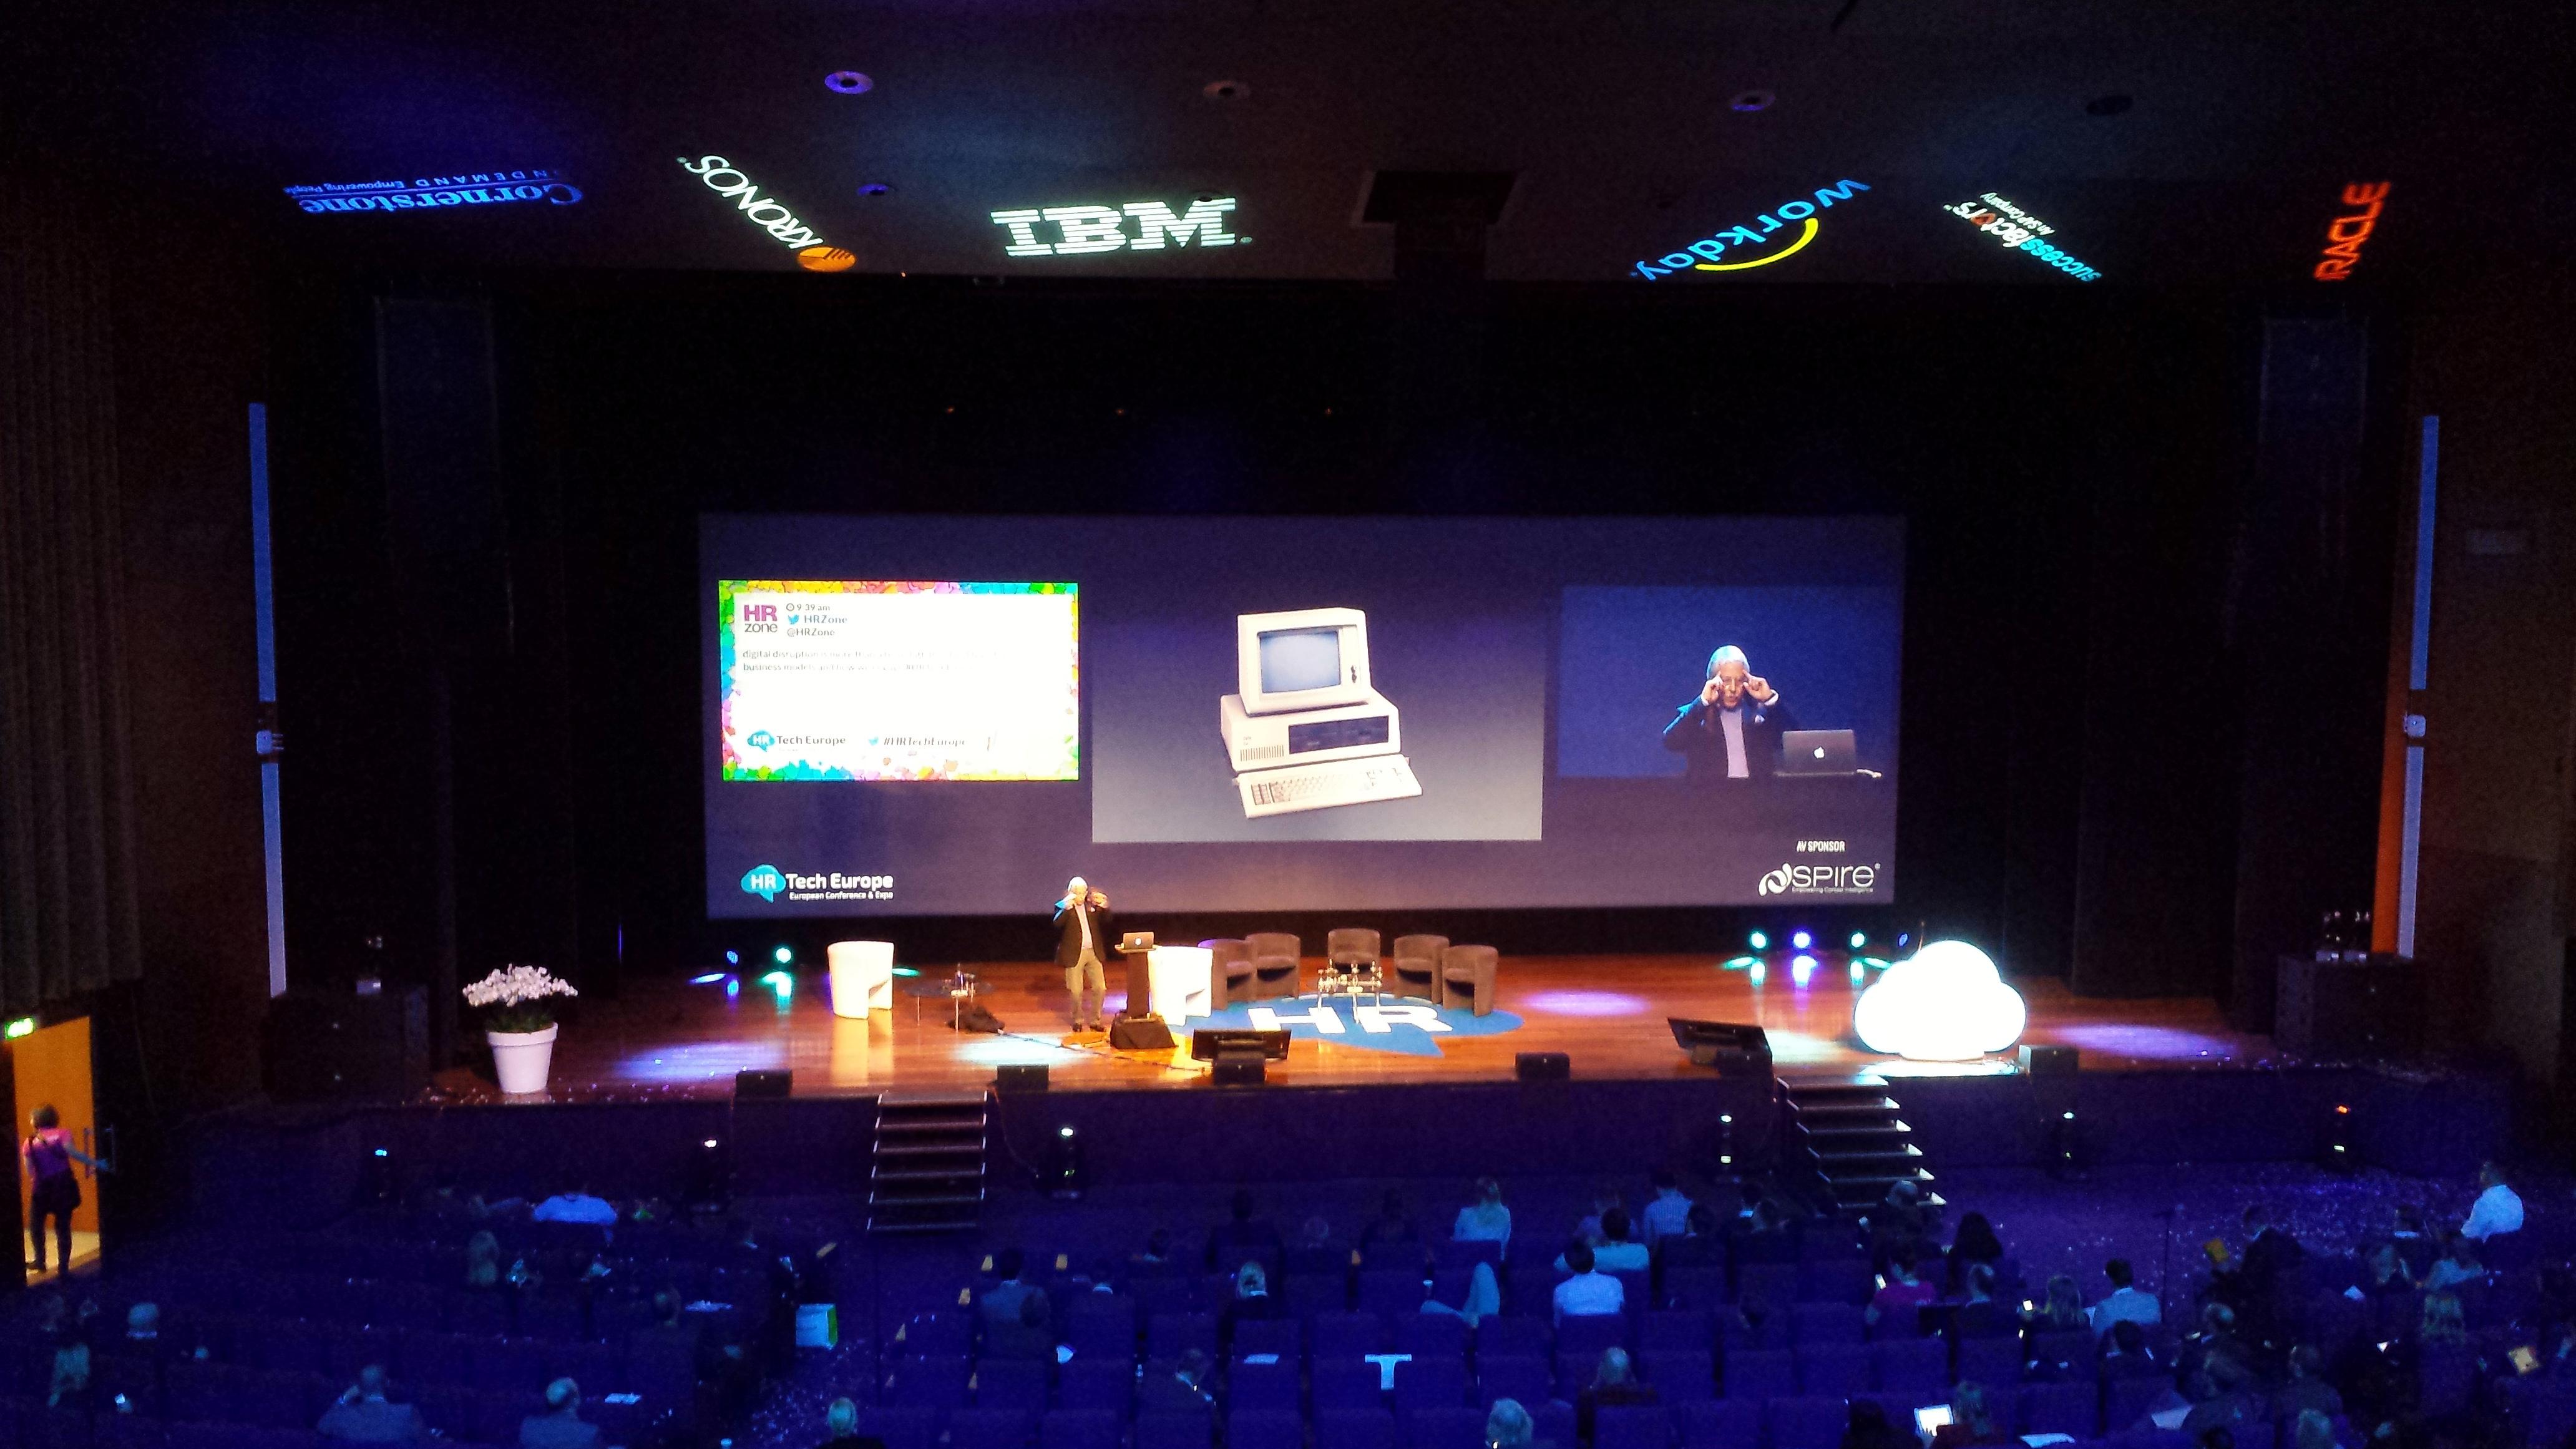 Gary-Hamel-Presentation-@-HR-Tech-Europe-2014